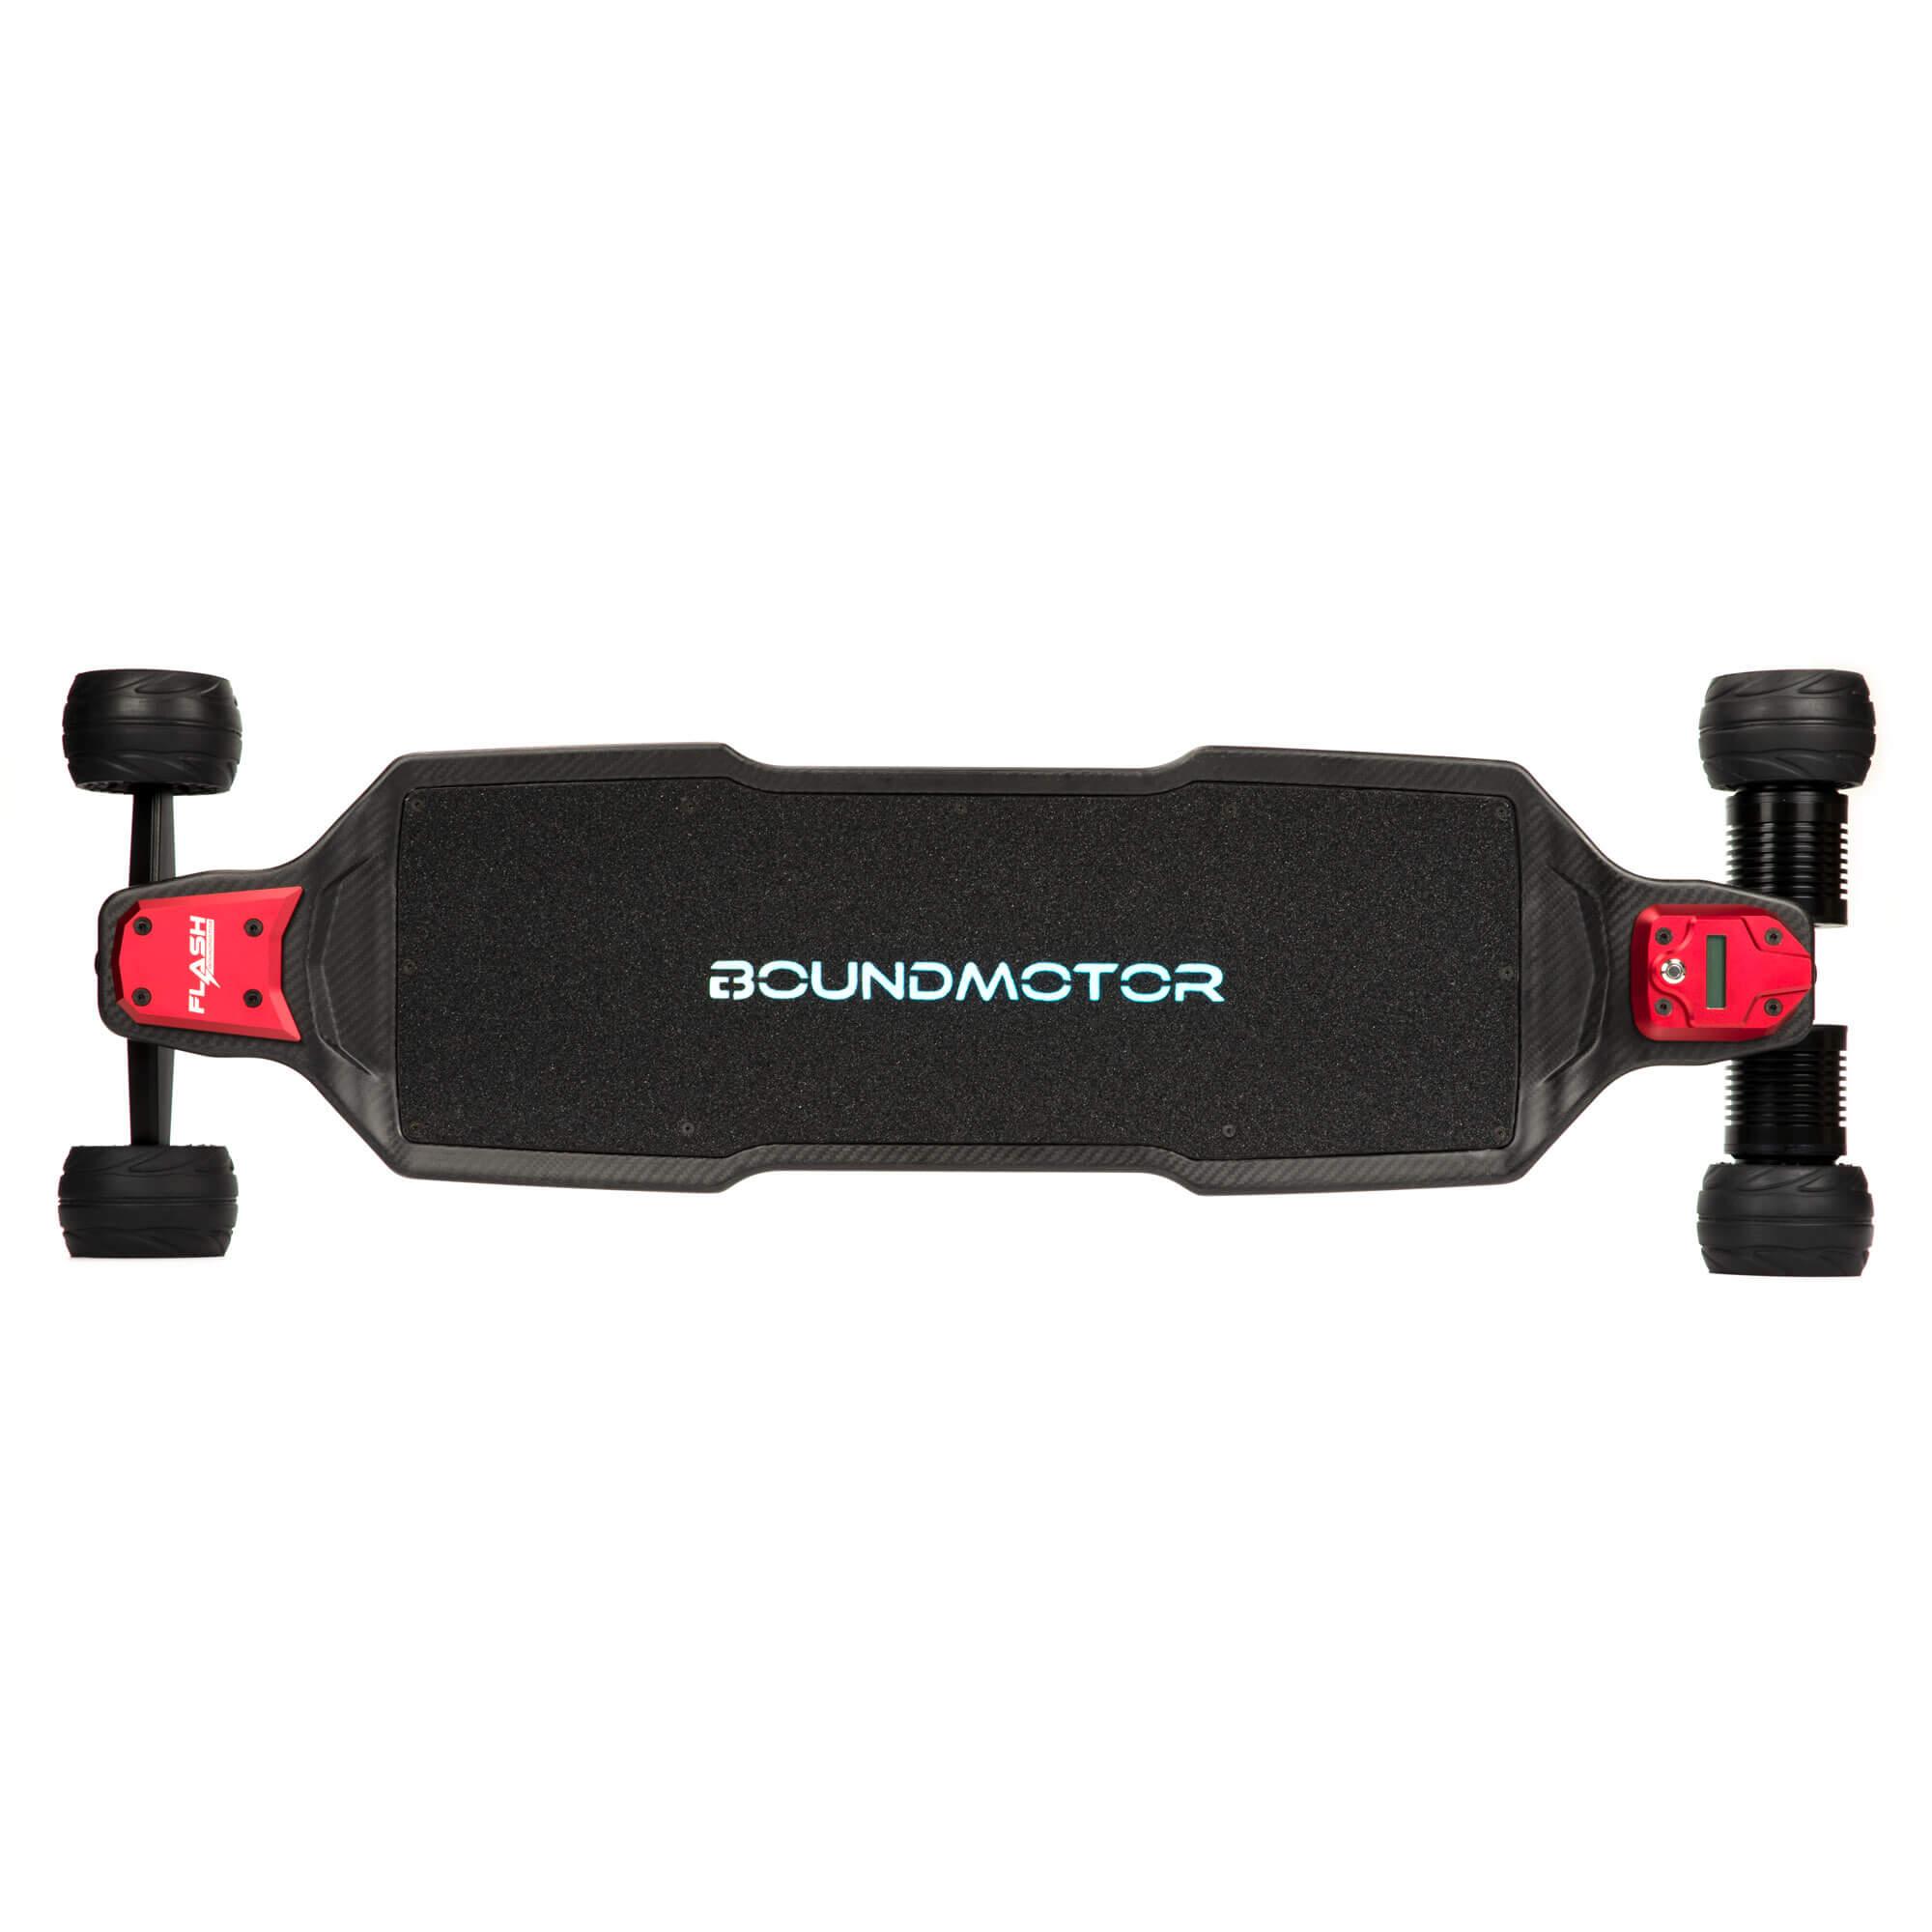 Direct drive electric skateboard - new boundmotor D1